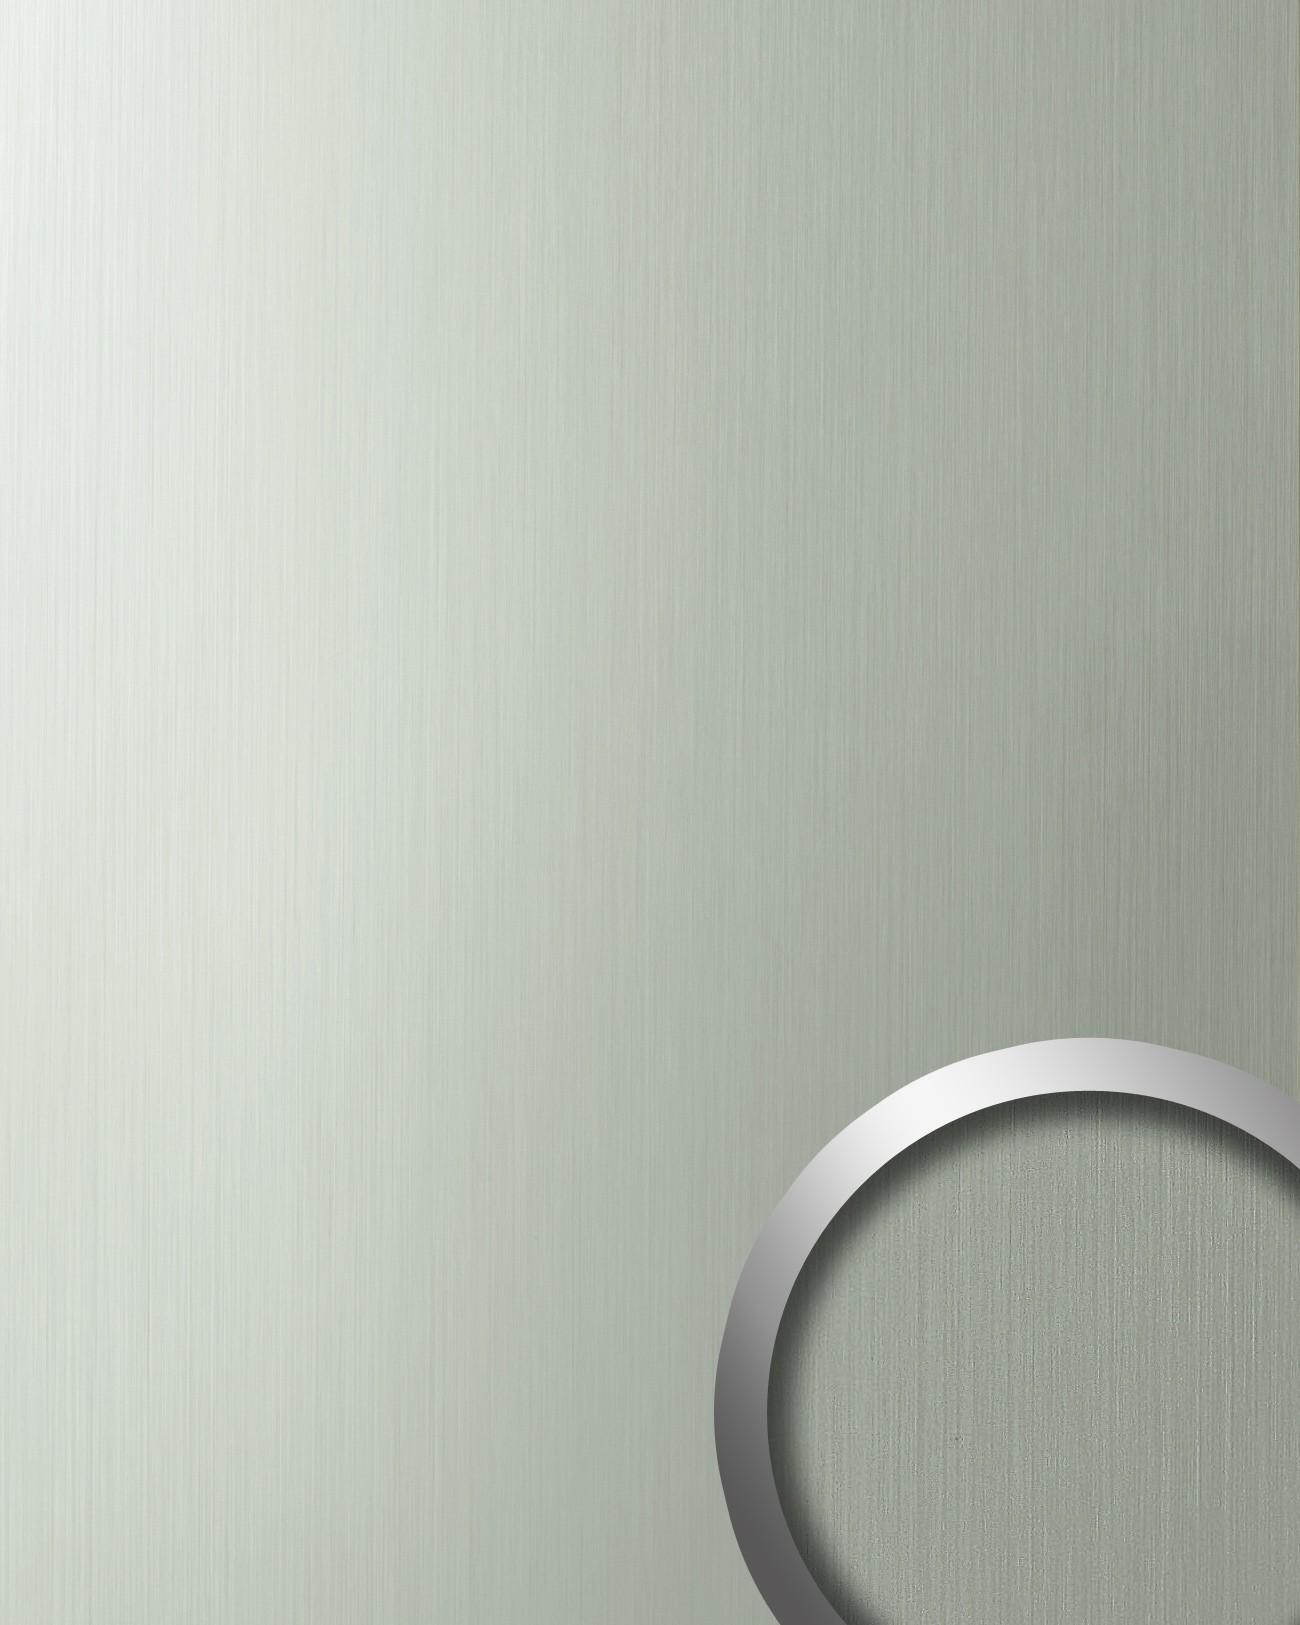 Wandpaneel Metall-Optik matt-glänzend WallFace 10199 DECO HGS ...